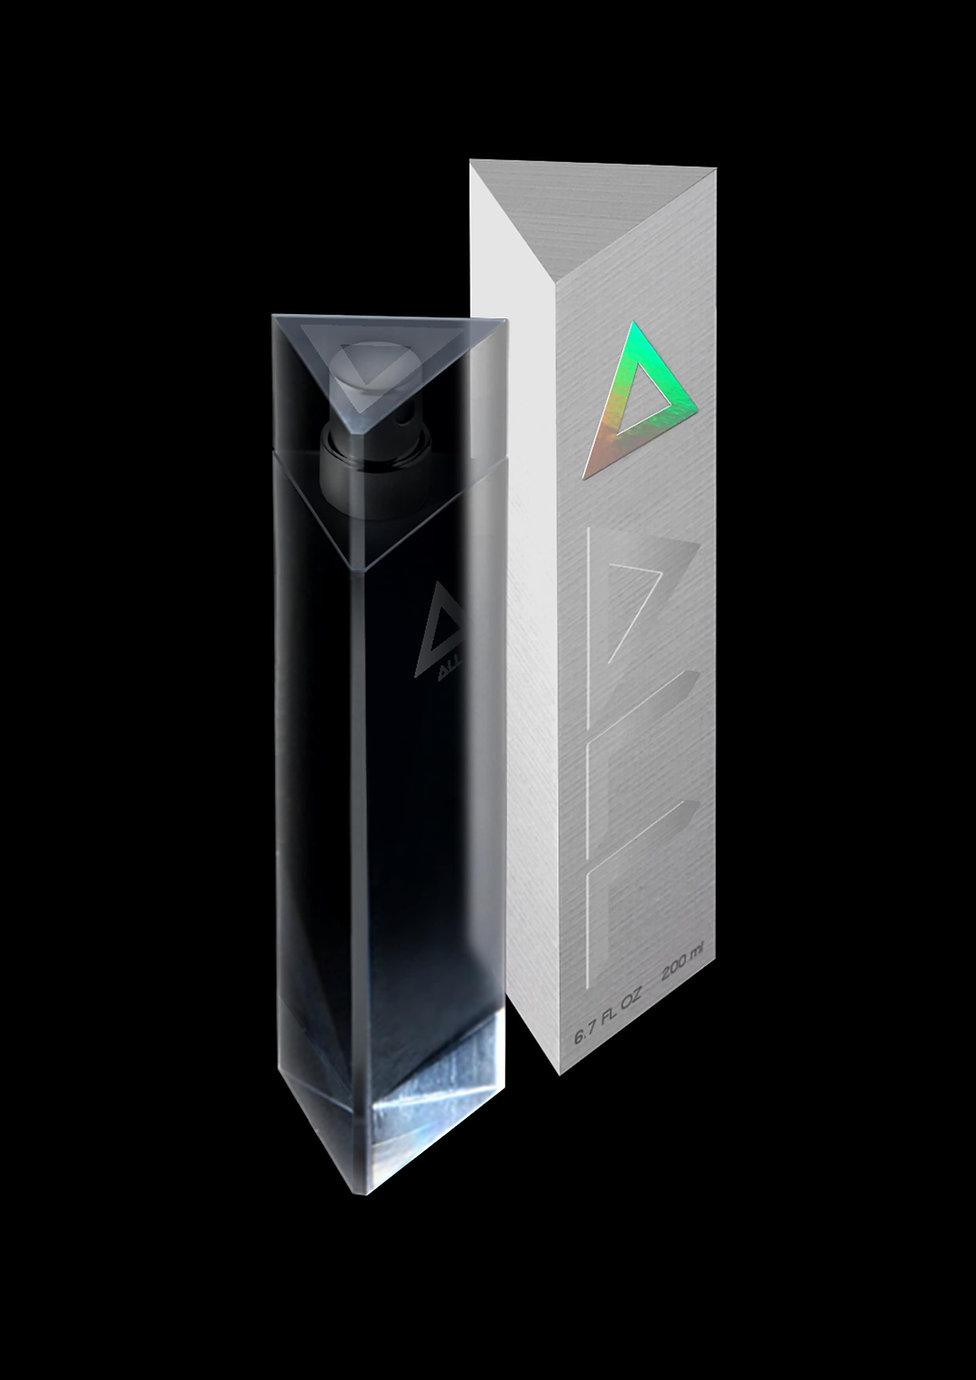 bottlebox-min.jpg